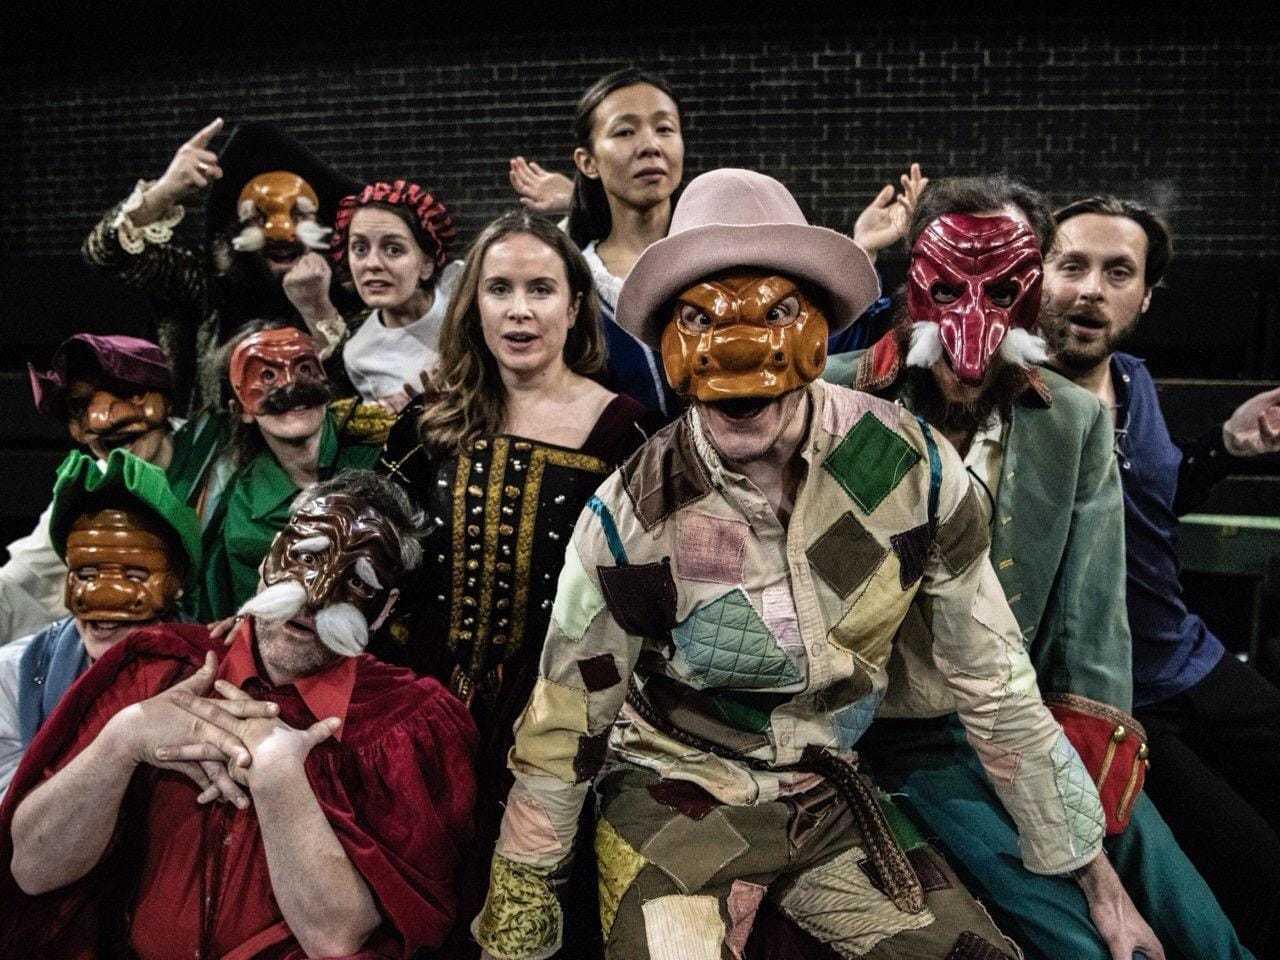 London cast, February 2019